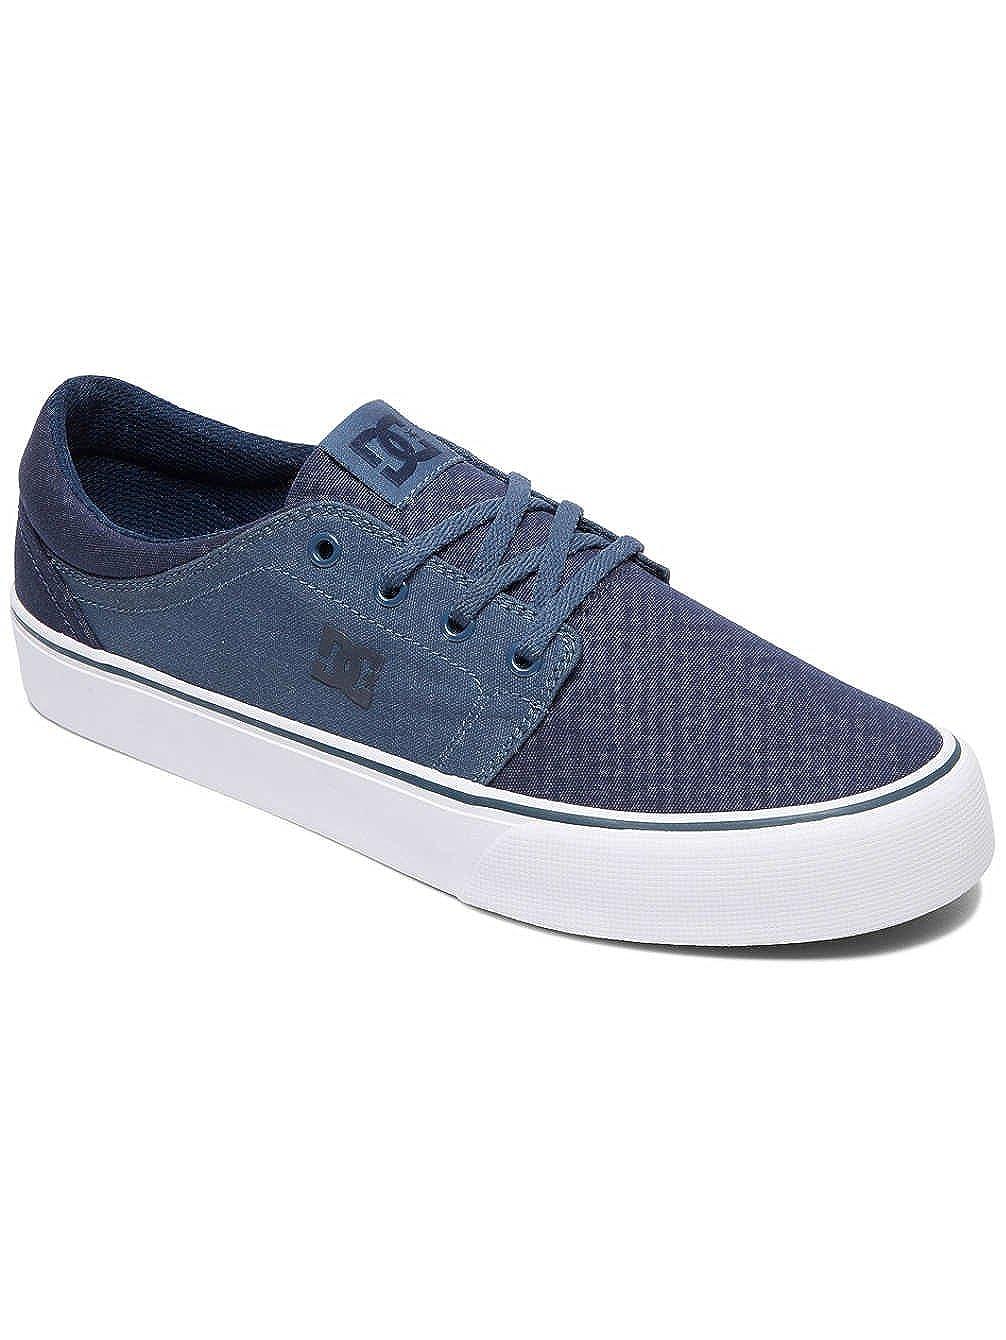 DC scarpe TONIK - - - Scarpe da Ginnastica Basse Uomo | Eccellente valore  0d56b0